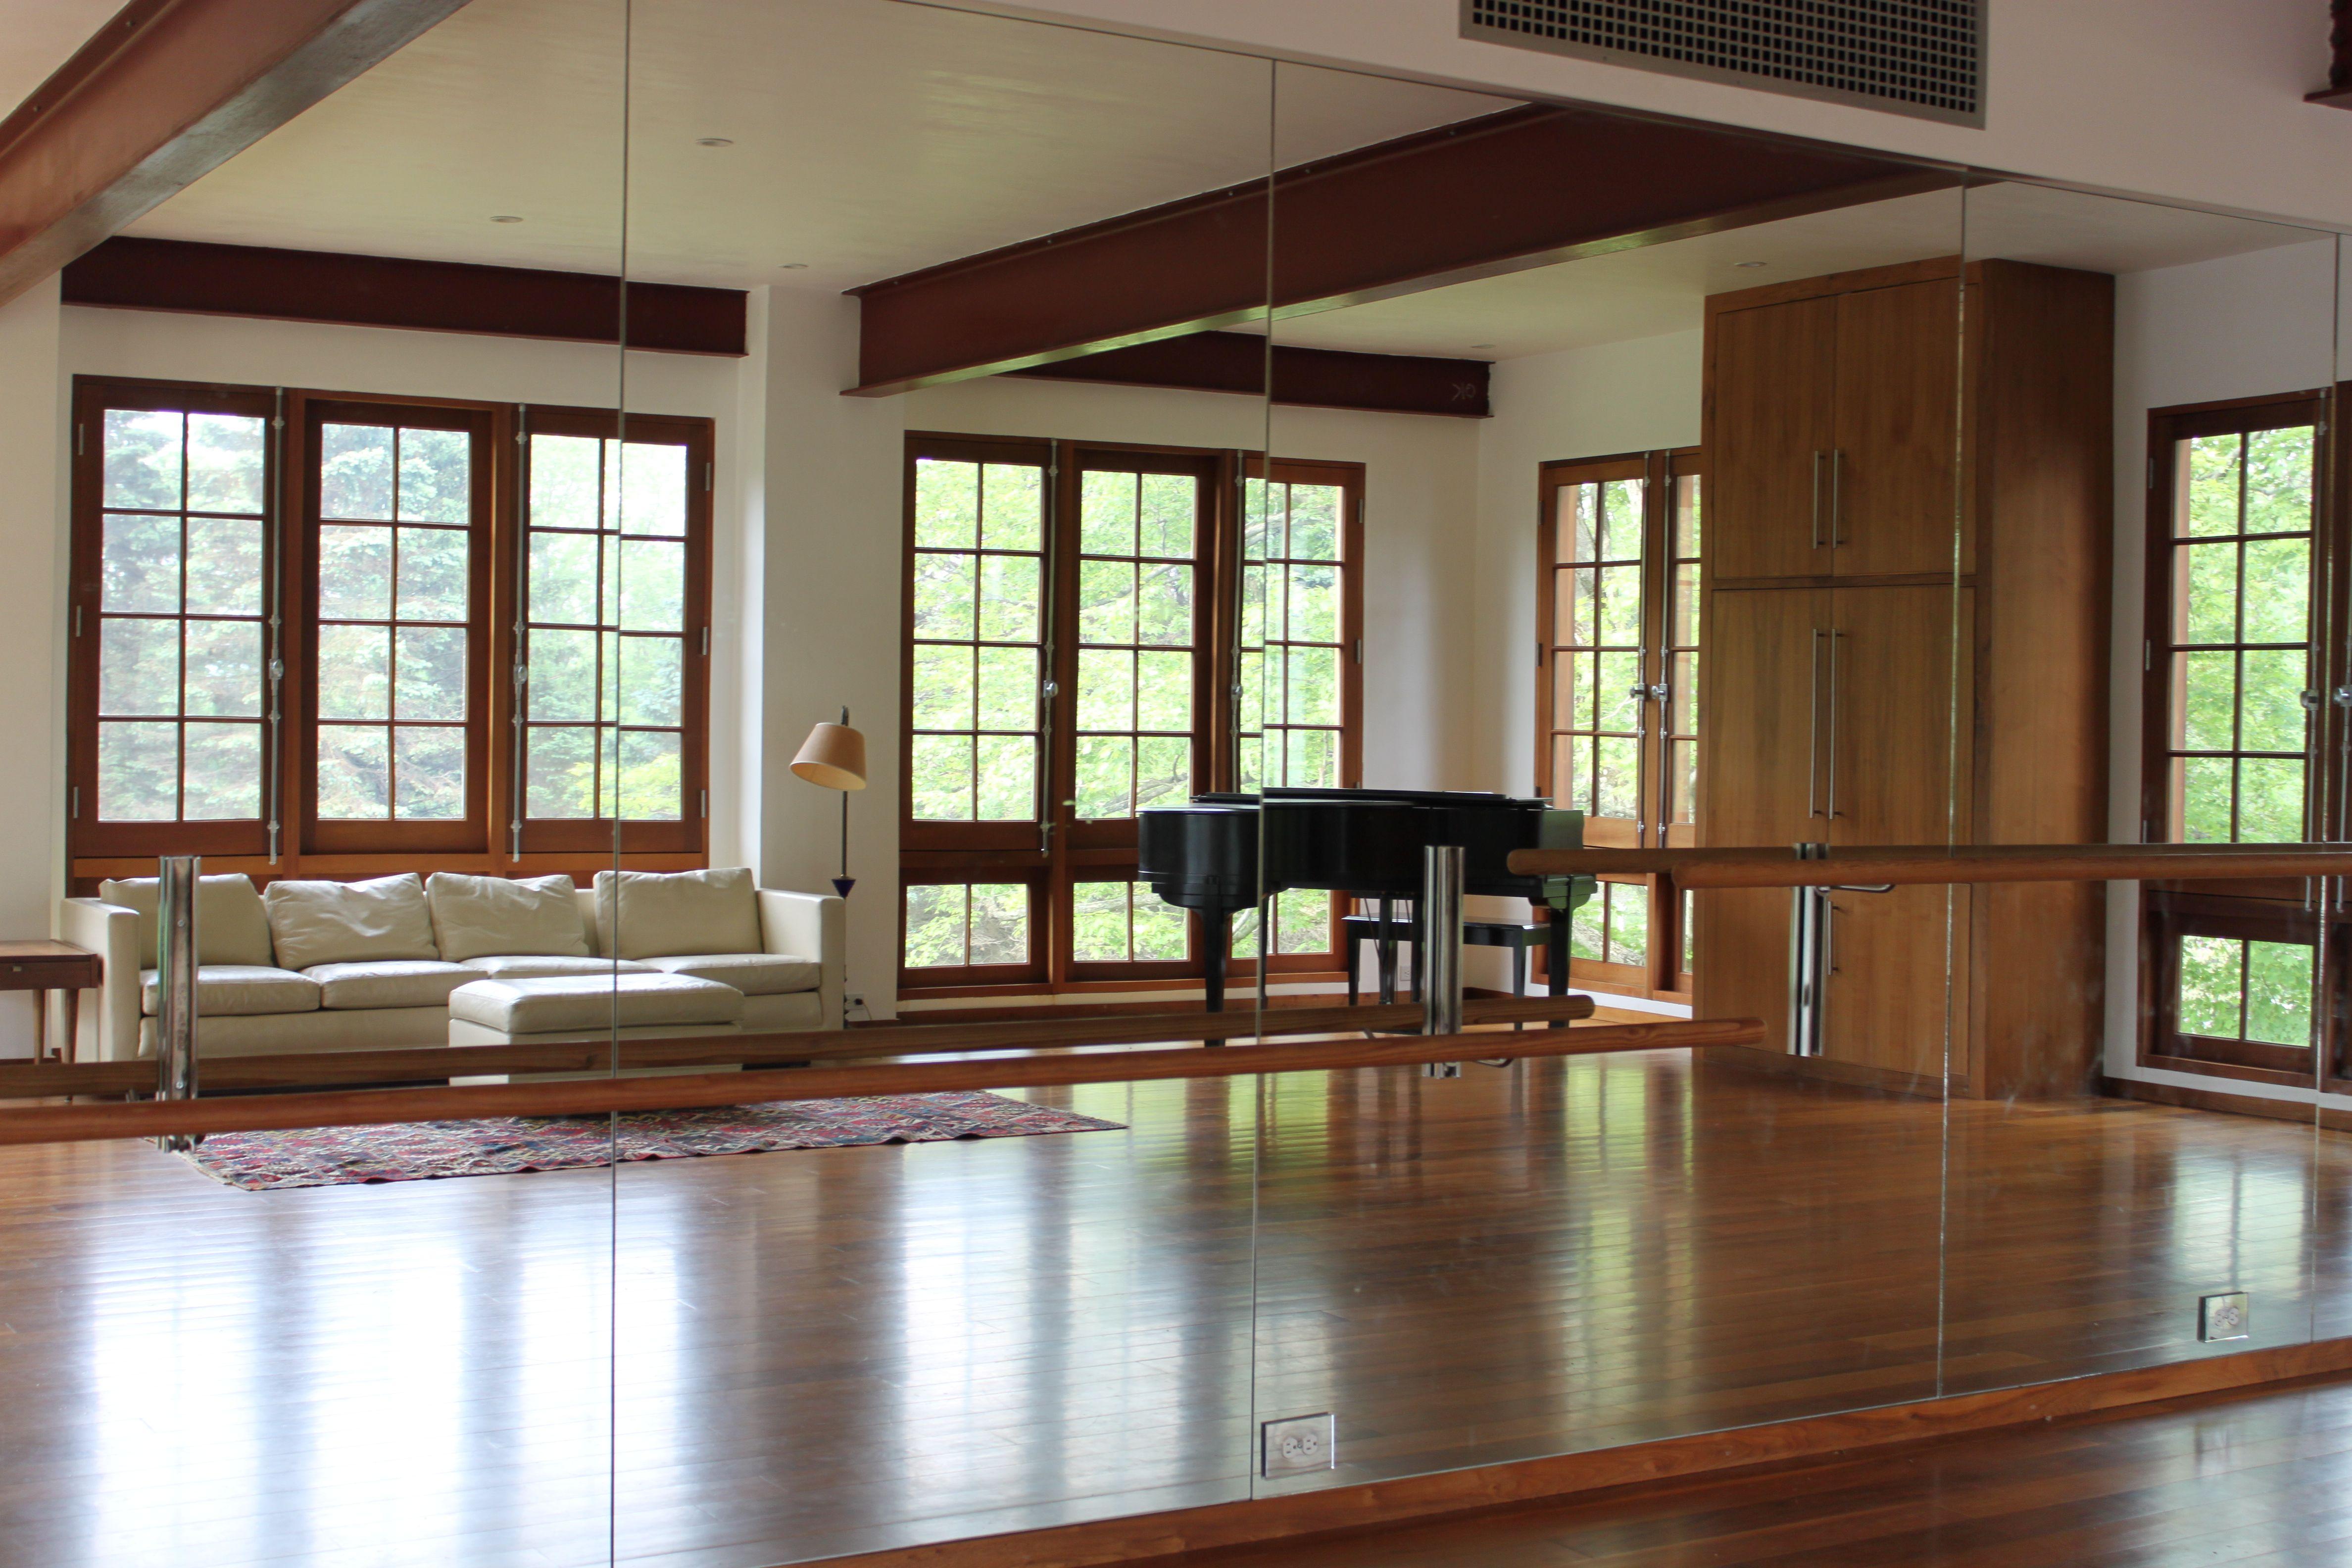 Dance Studio Design Ideas Home Art Dma Homes: Pin By Lynn Dickinson On Home Dance/Yoga Spaces